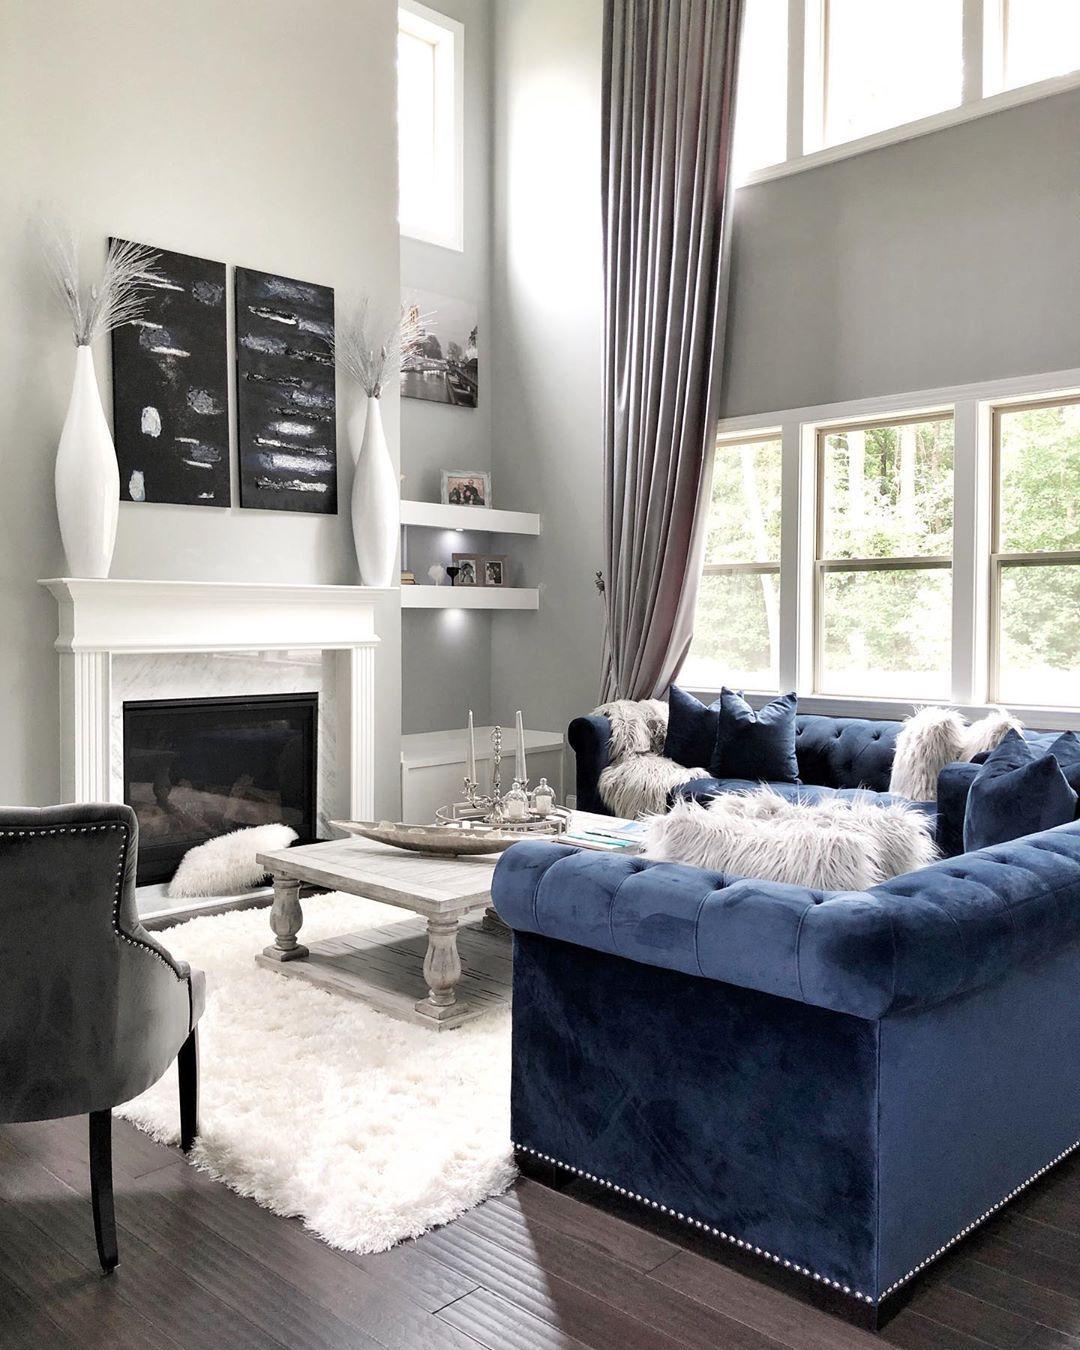 Slay On Instagram Hello My Beautiful Insta Family I Made This 2 Art Today And I Really Loveeee Living Room Designs Living Room Inspo Living Room Decor My beautiful living room